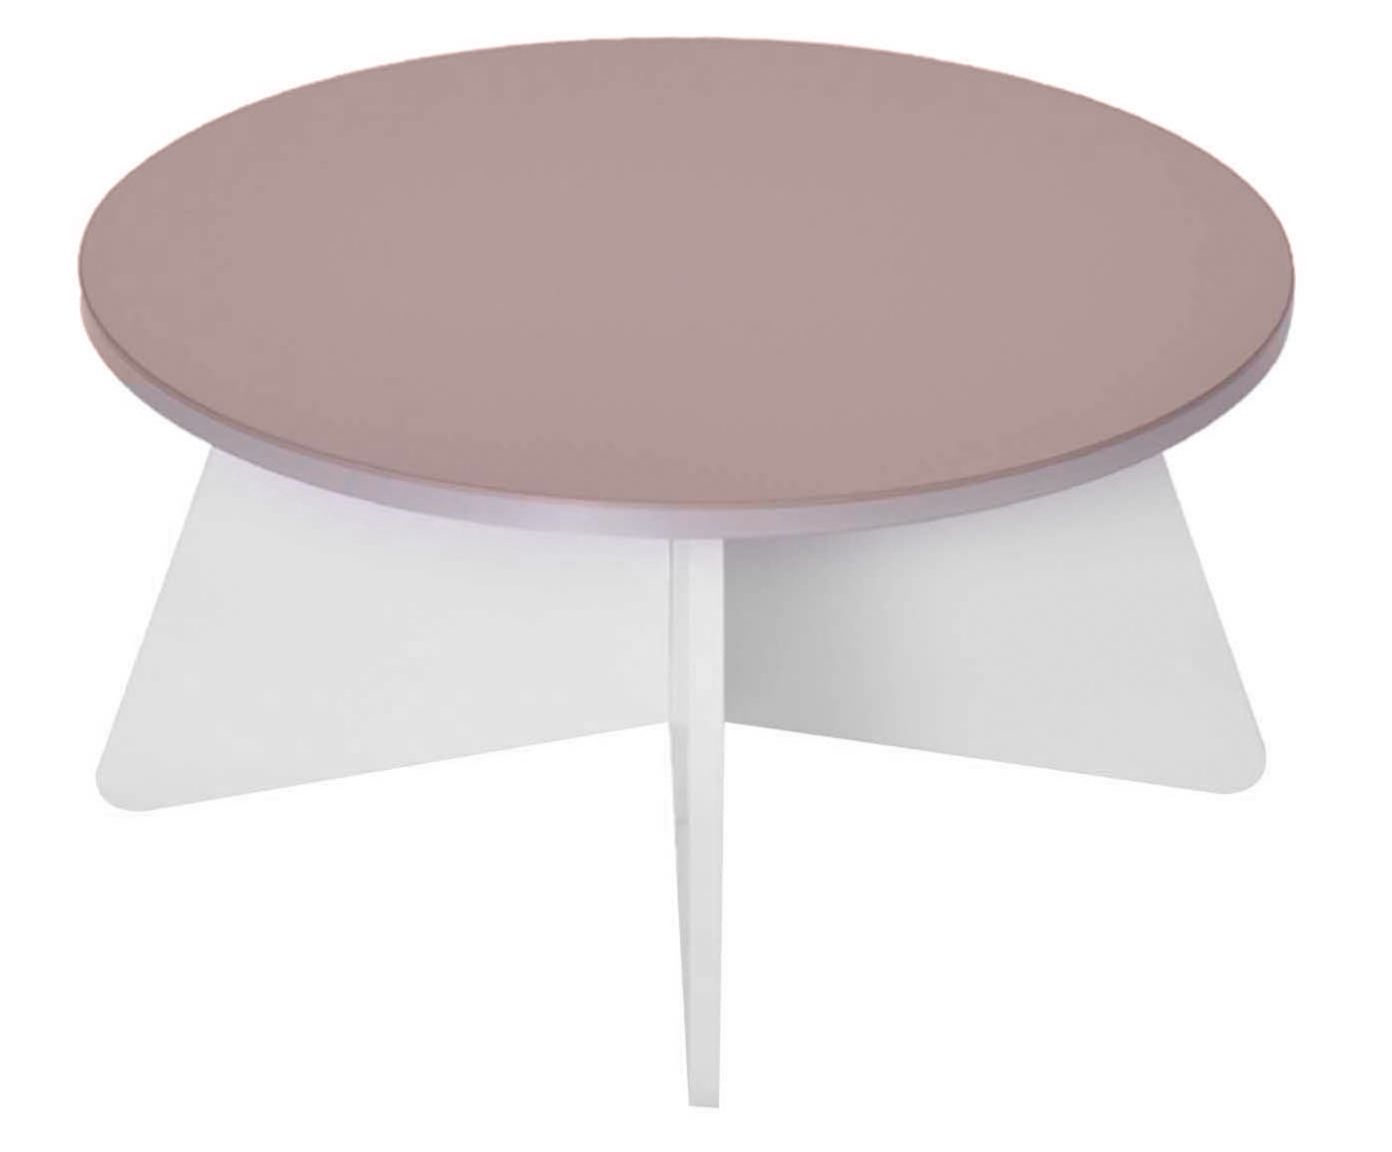 Mesa de Centro Rolo Vanille - 65cm | Westwing.com.br